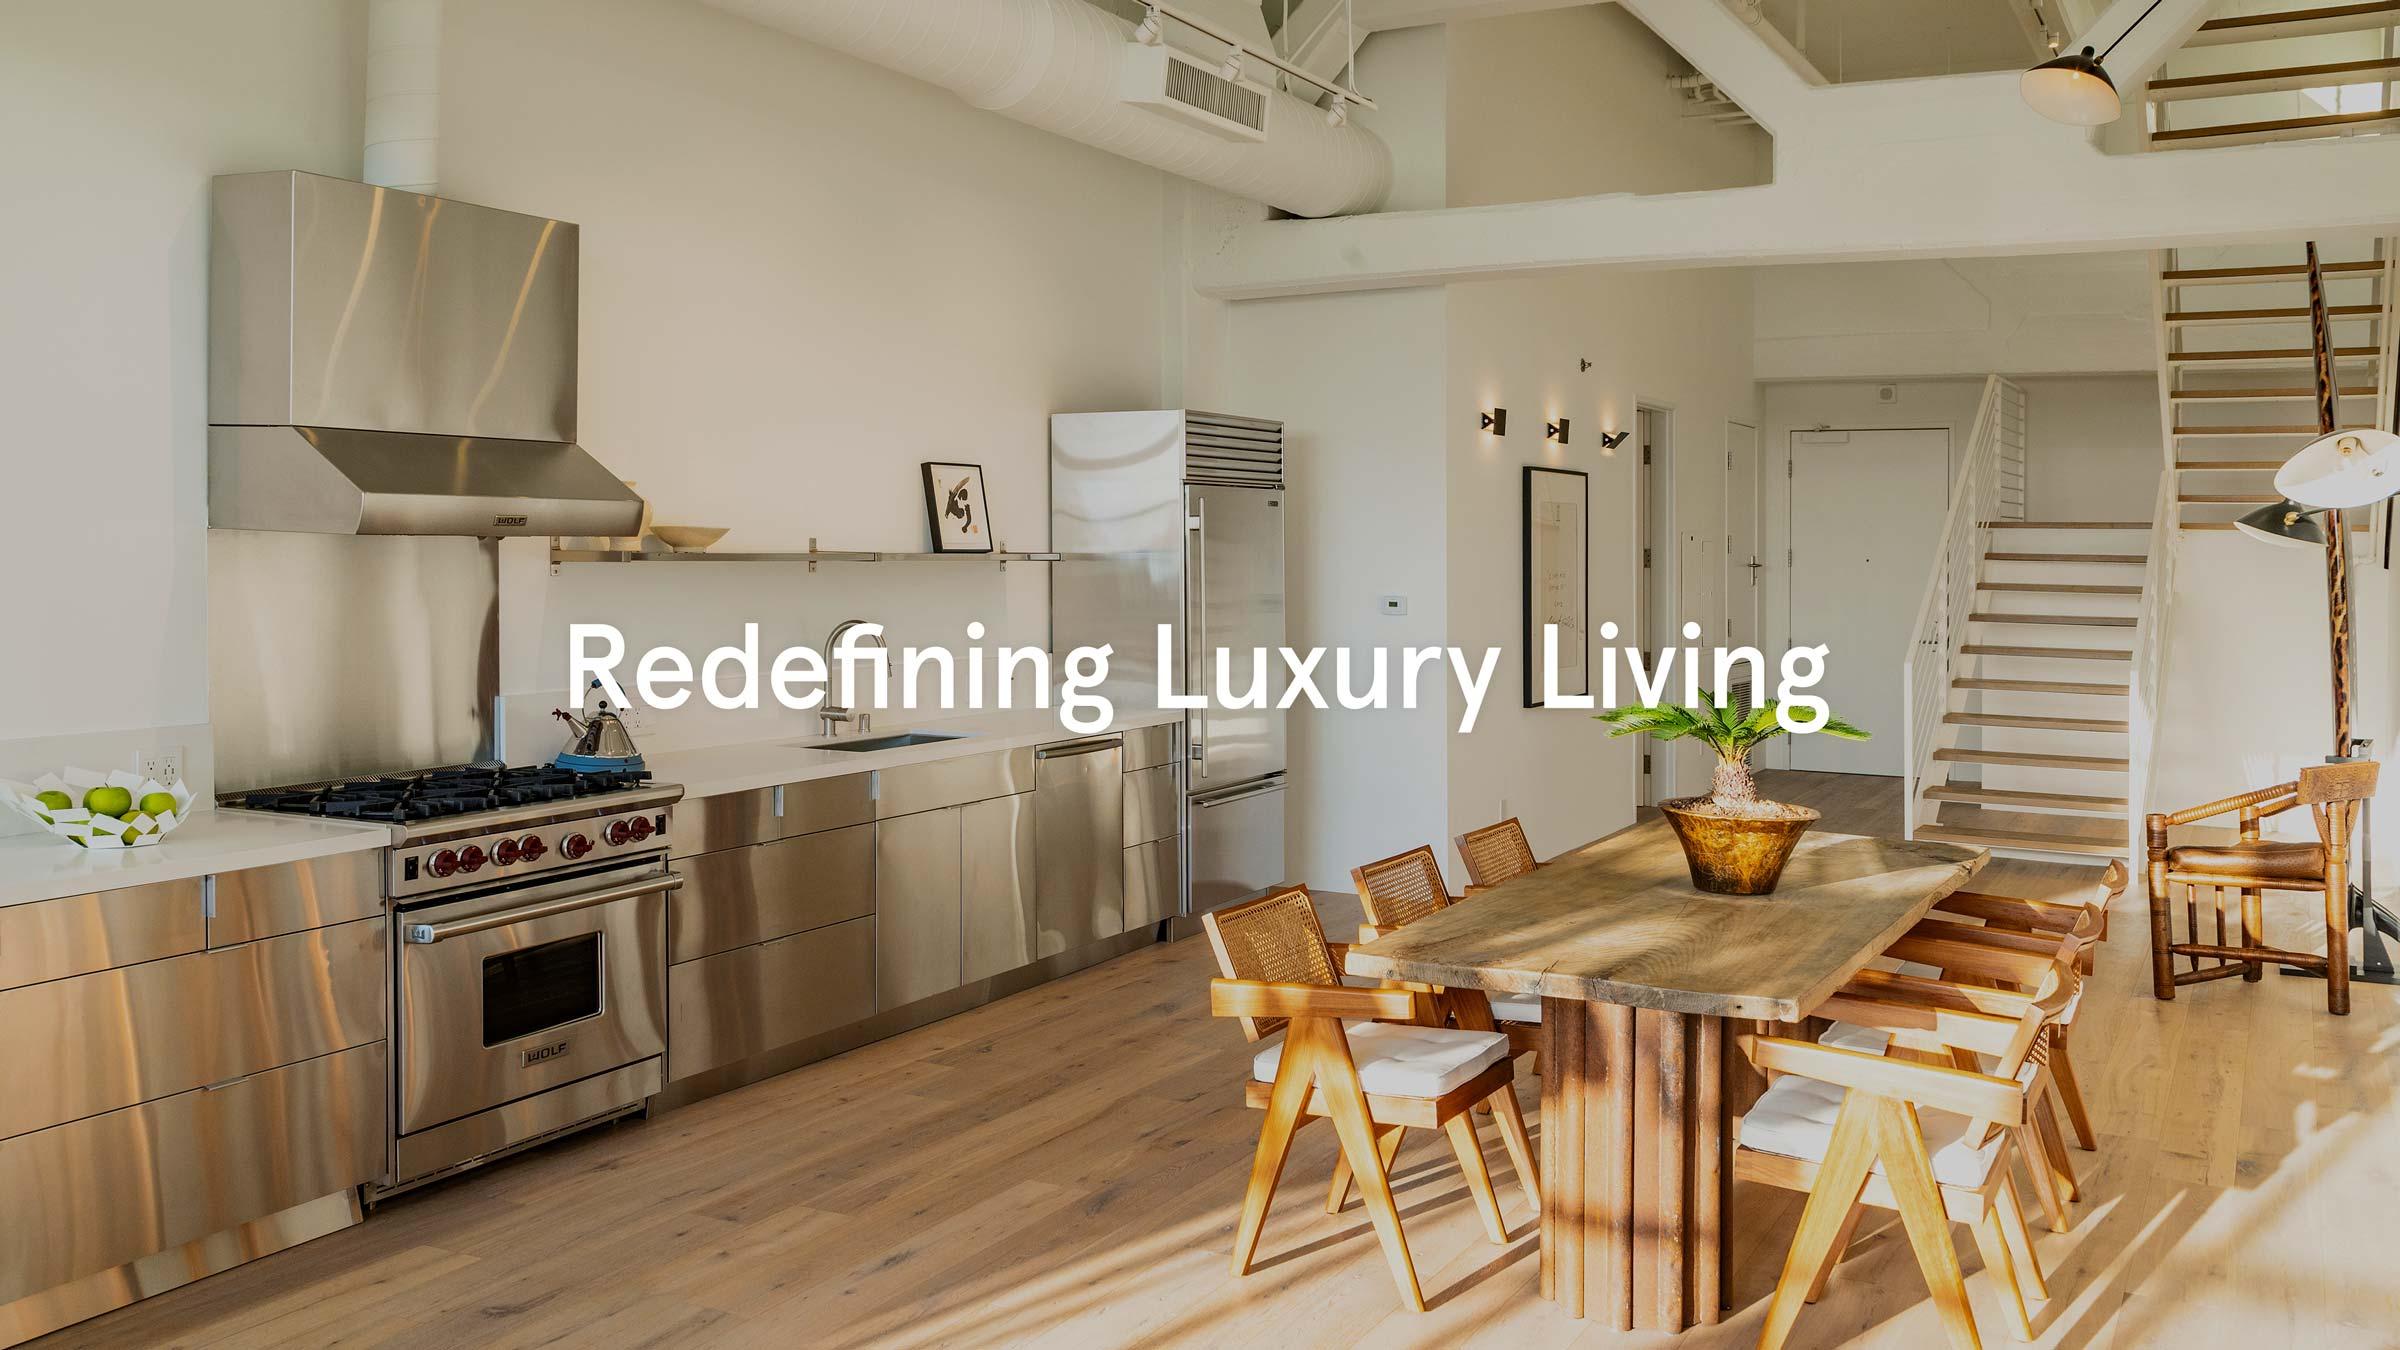 Redefining luxury living interior shot